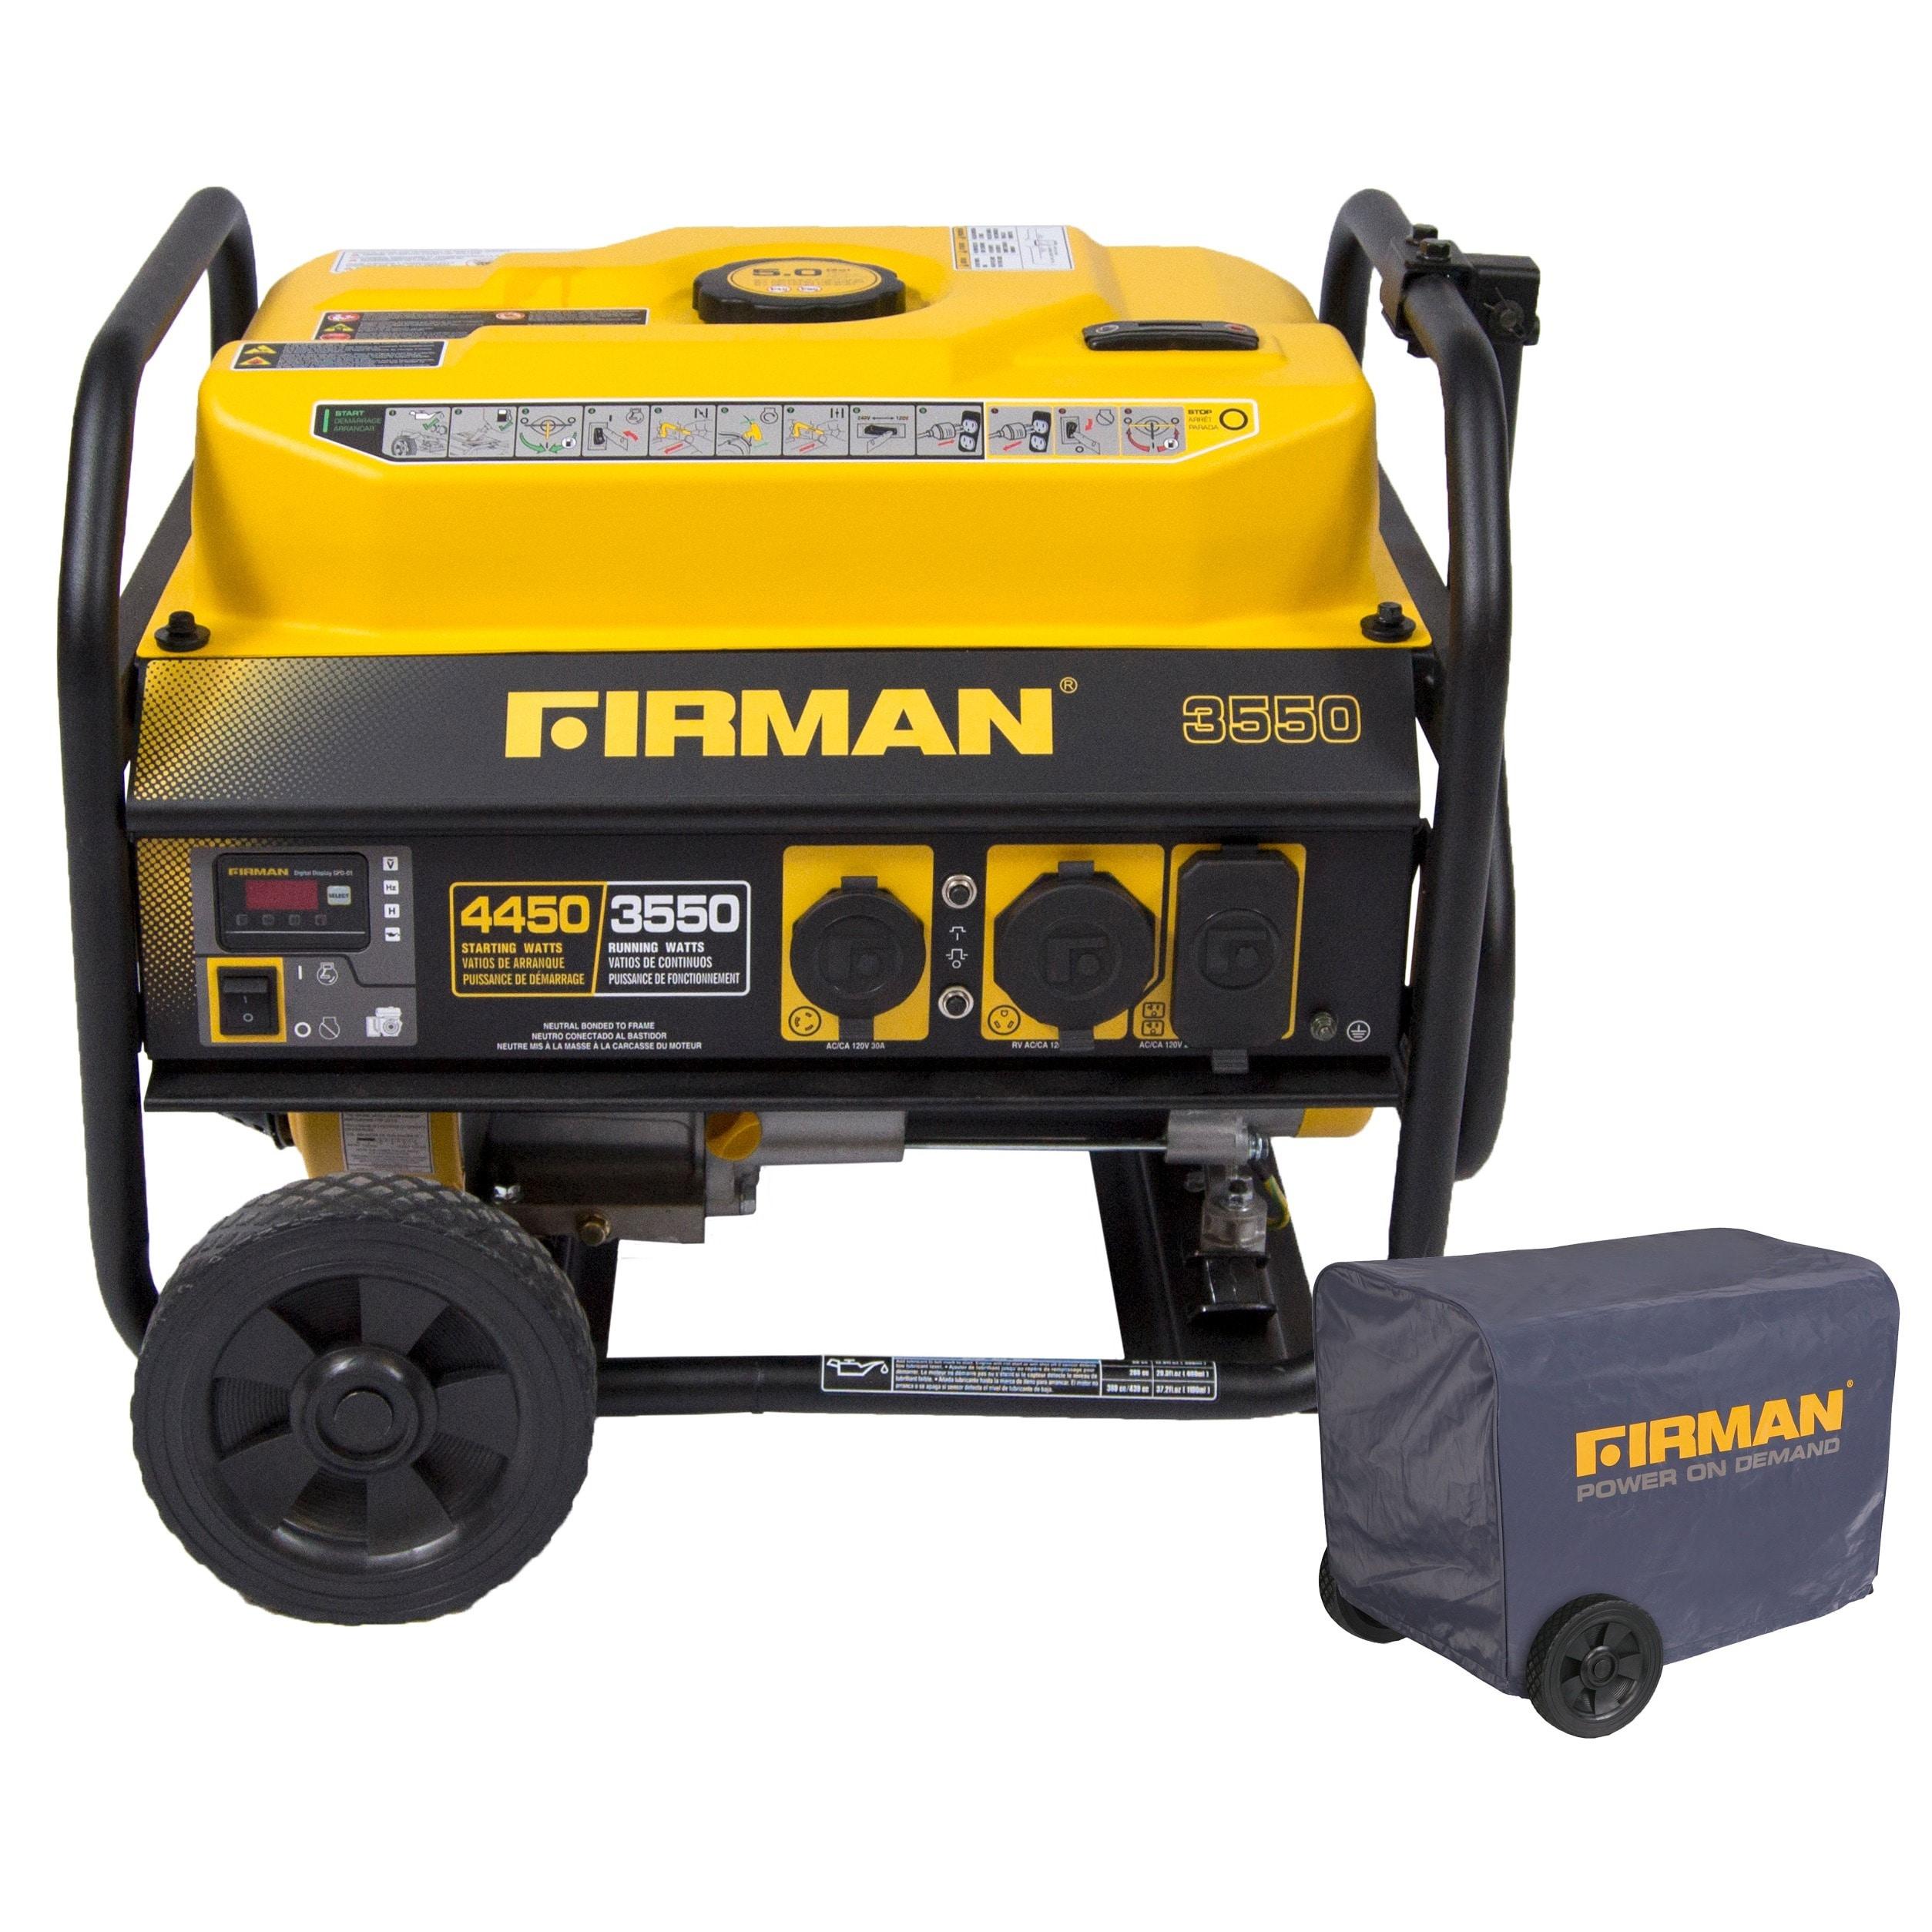 Firman Power Equipment P Gas powered Performance Series